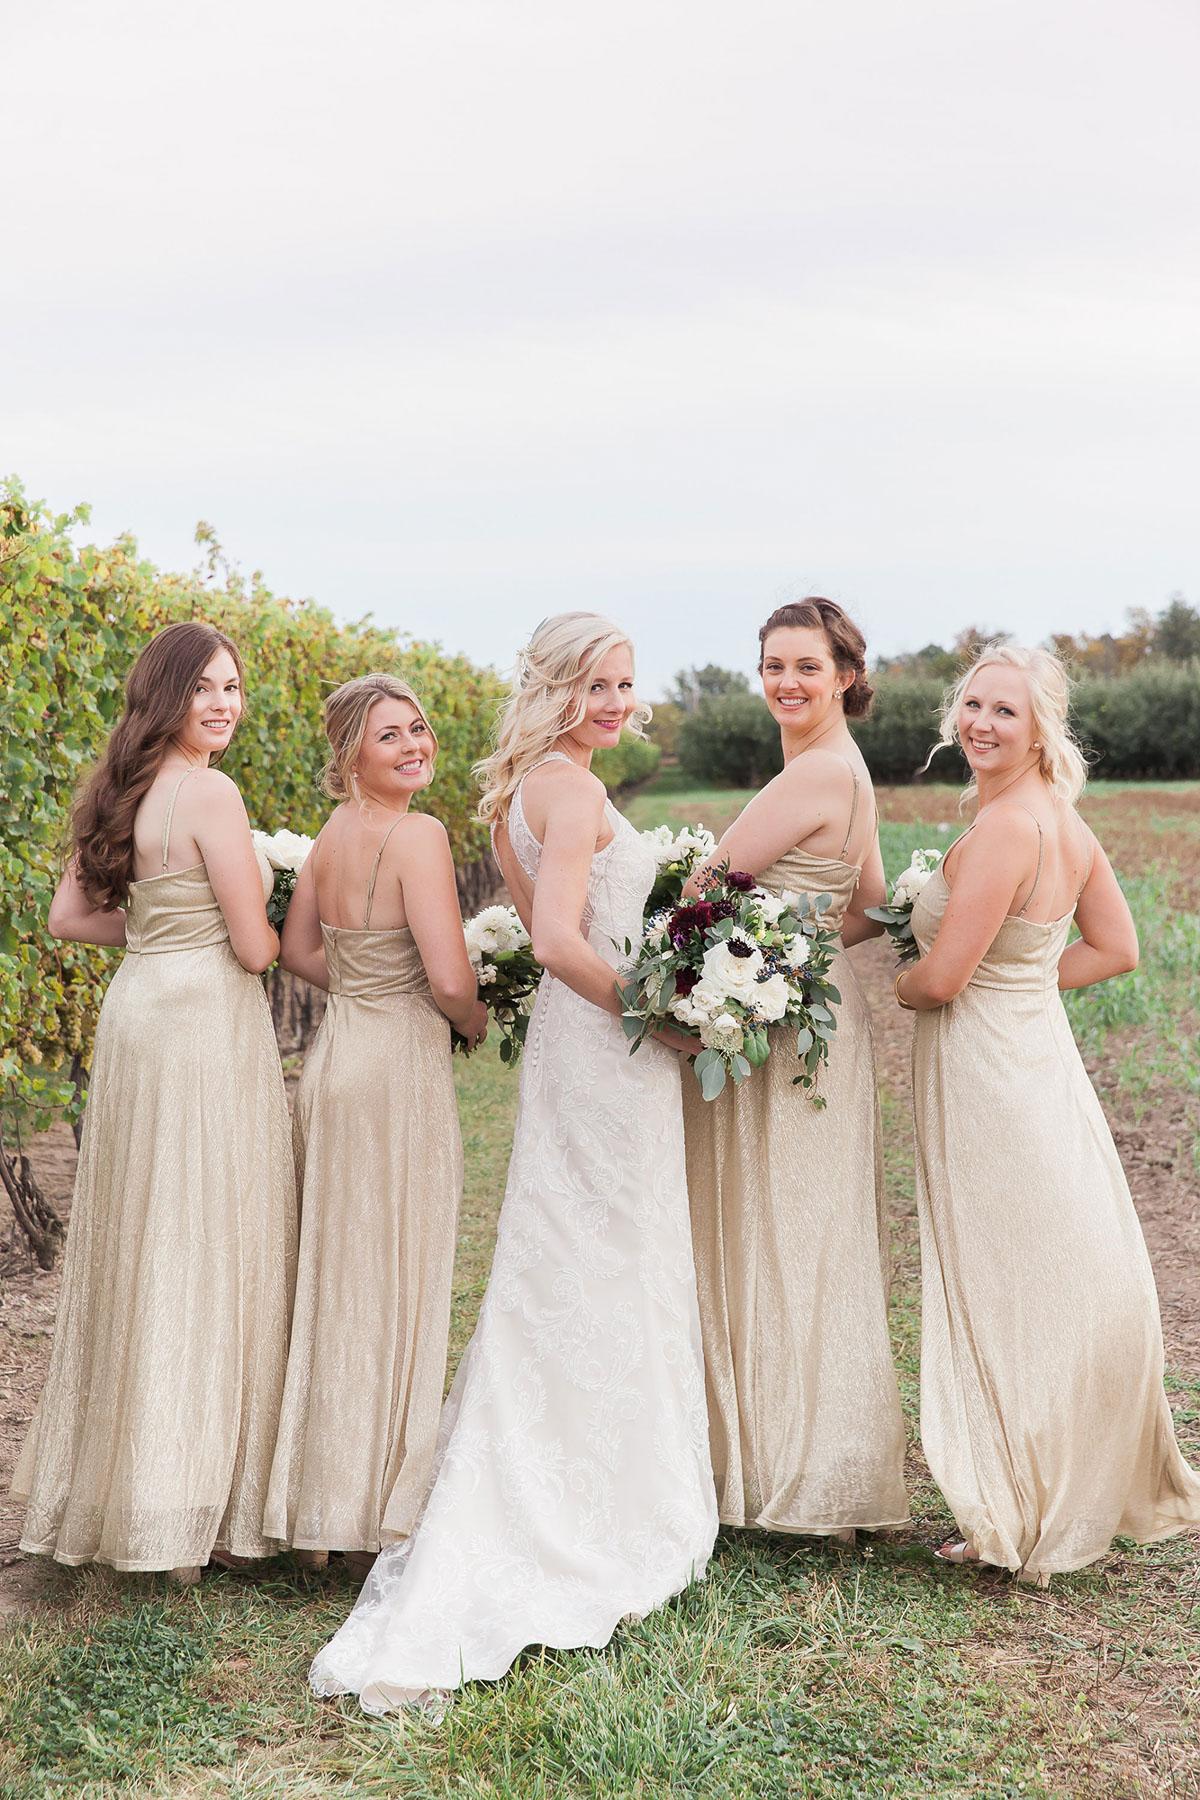 gemini-photography-vineyard-bride-swish-list-honsberger-estates-jordan-wedding-33.jpg